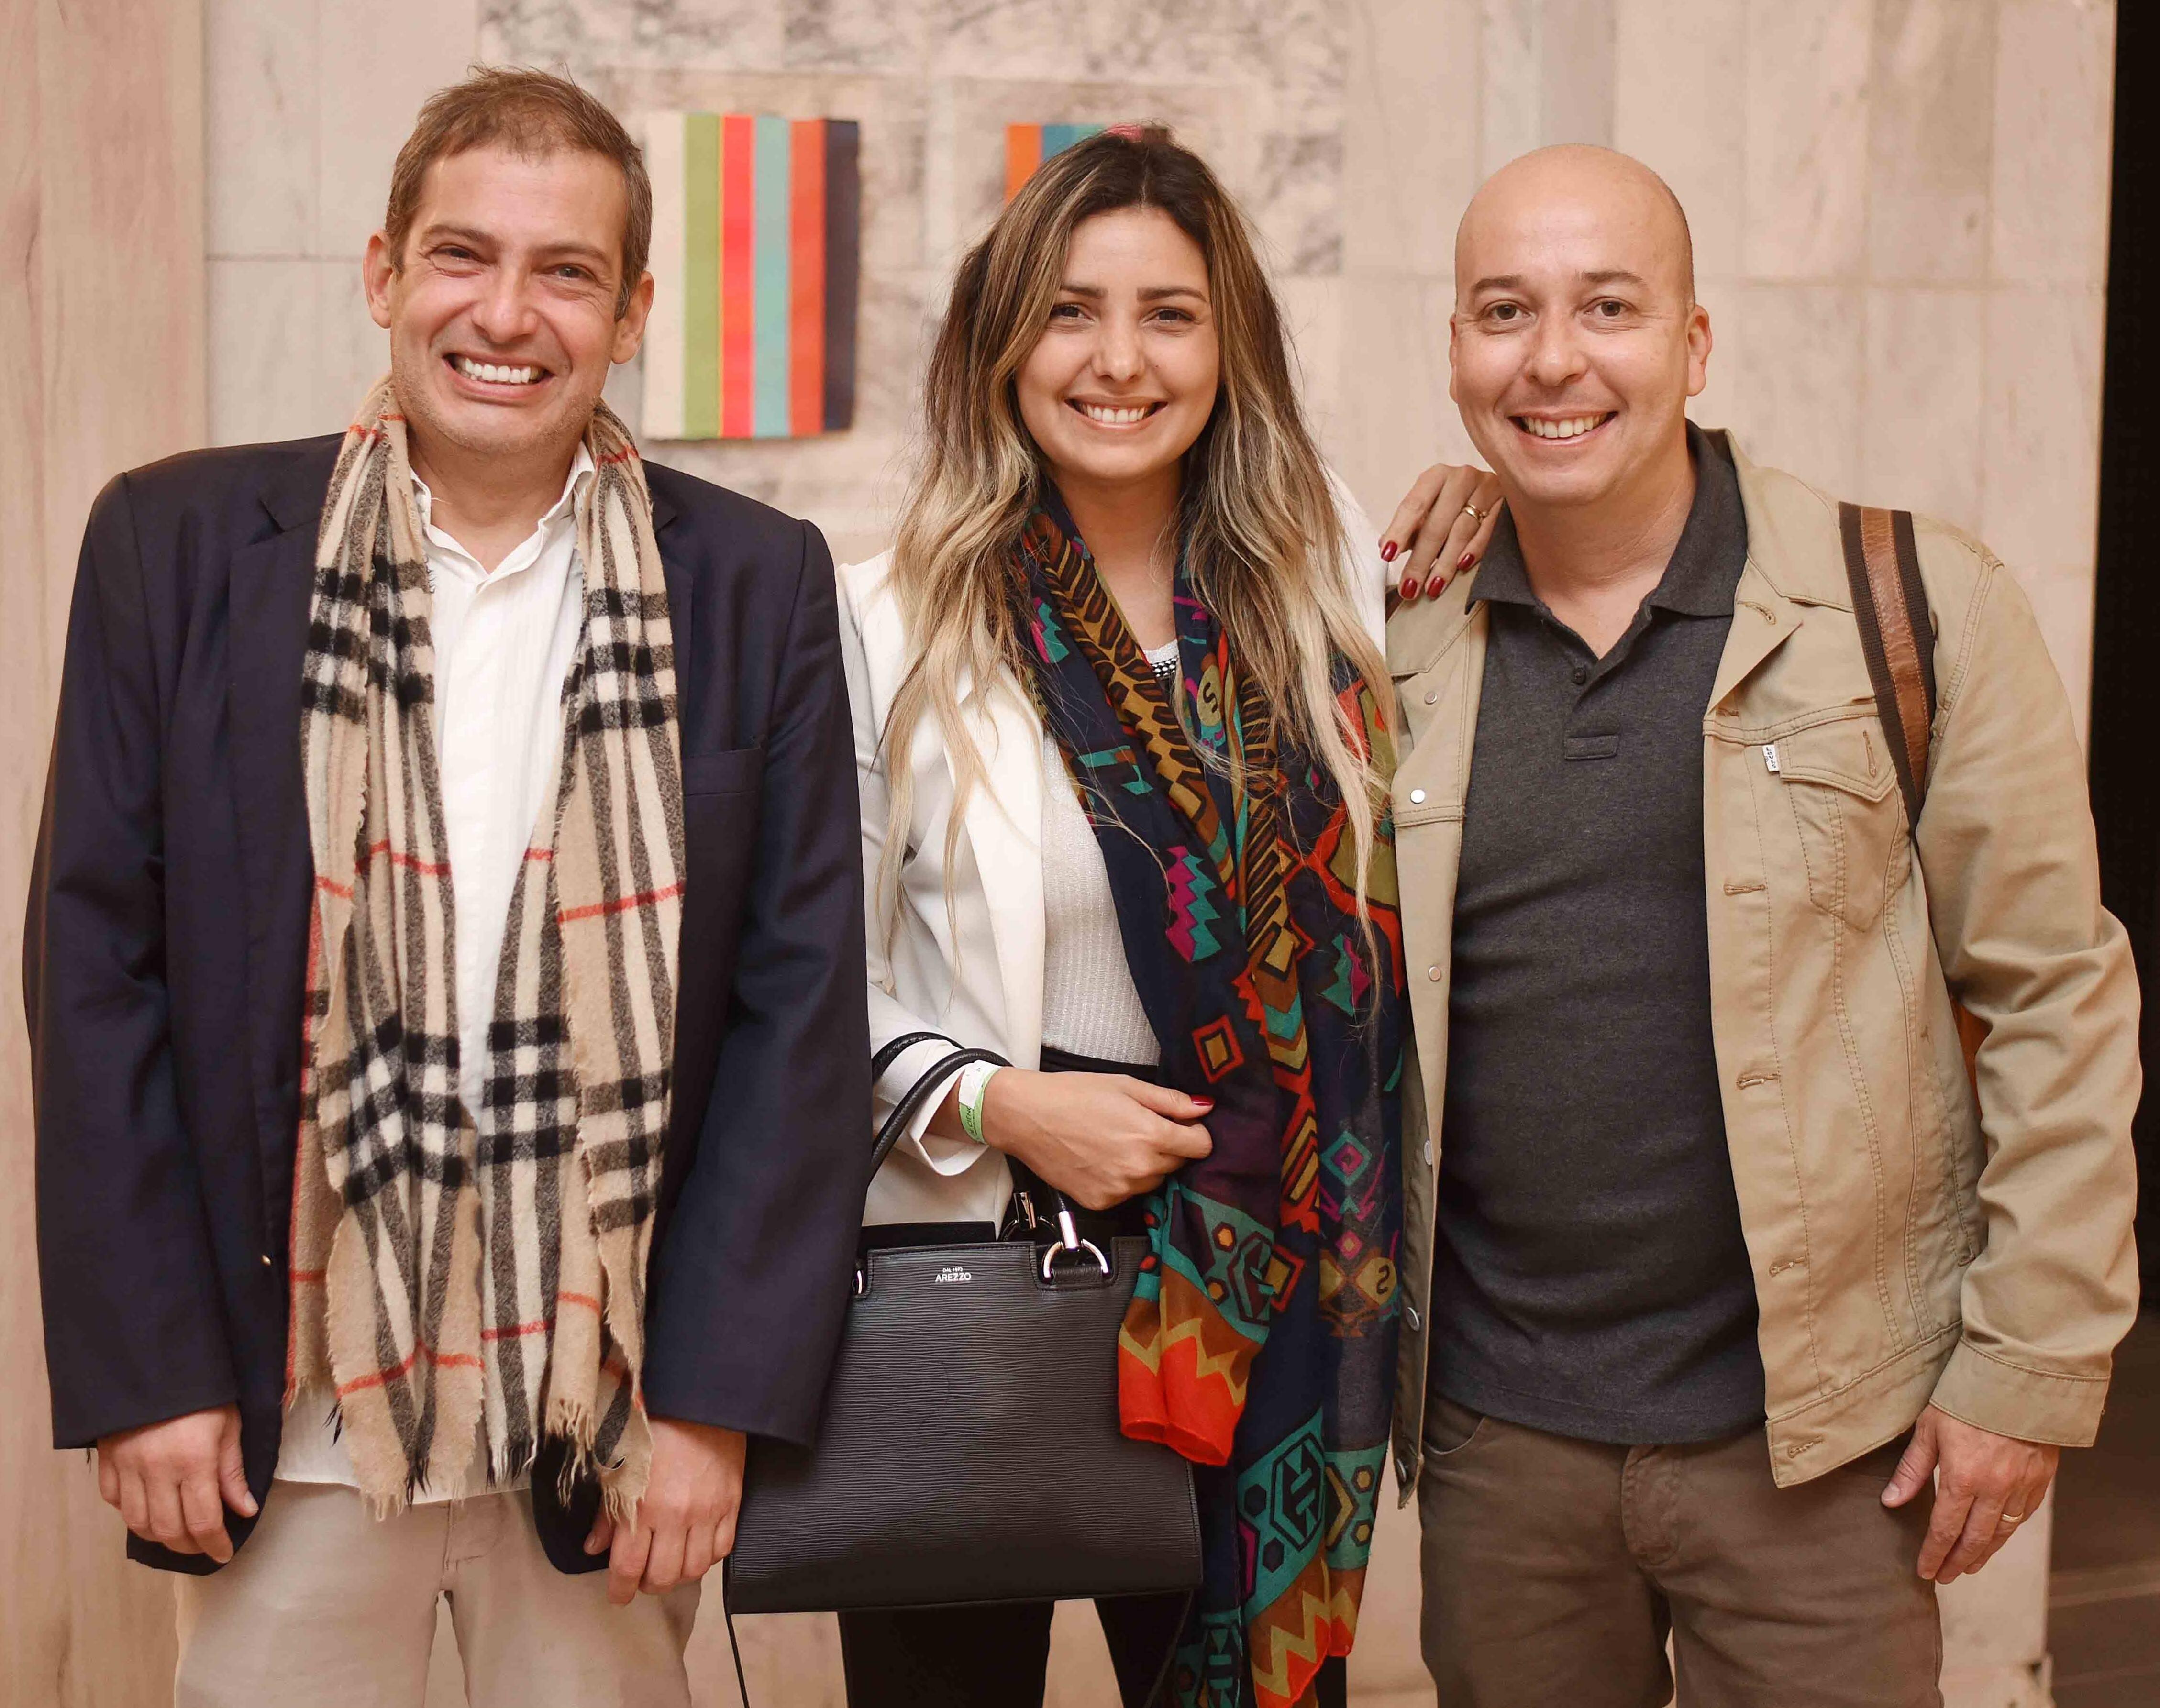 Pedro Schmidtt, Andrea e Peck Mecenas  /Foto: Ari Kaye